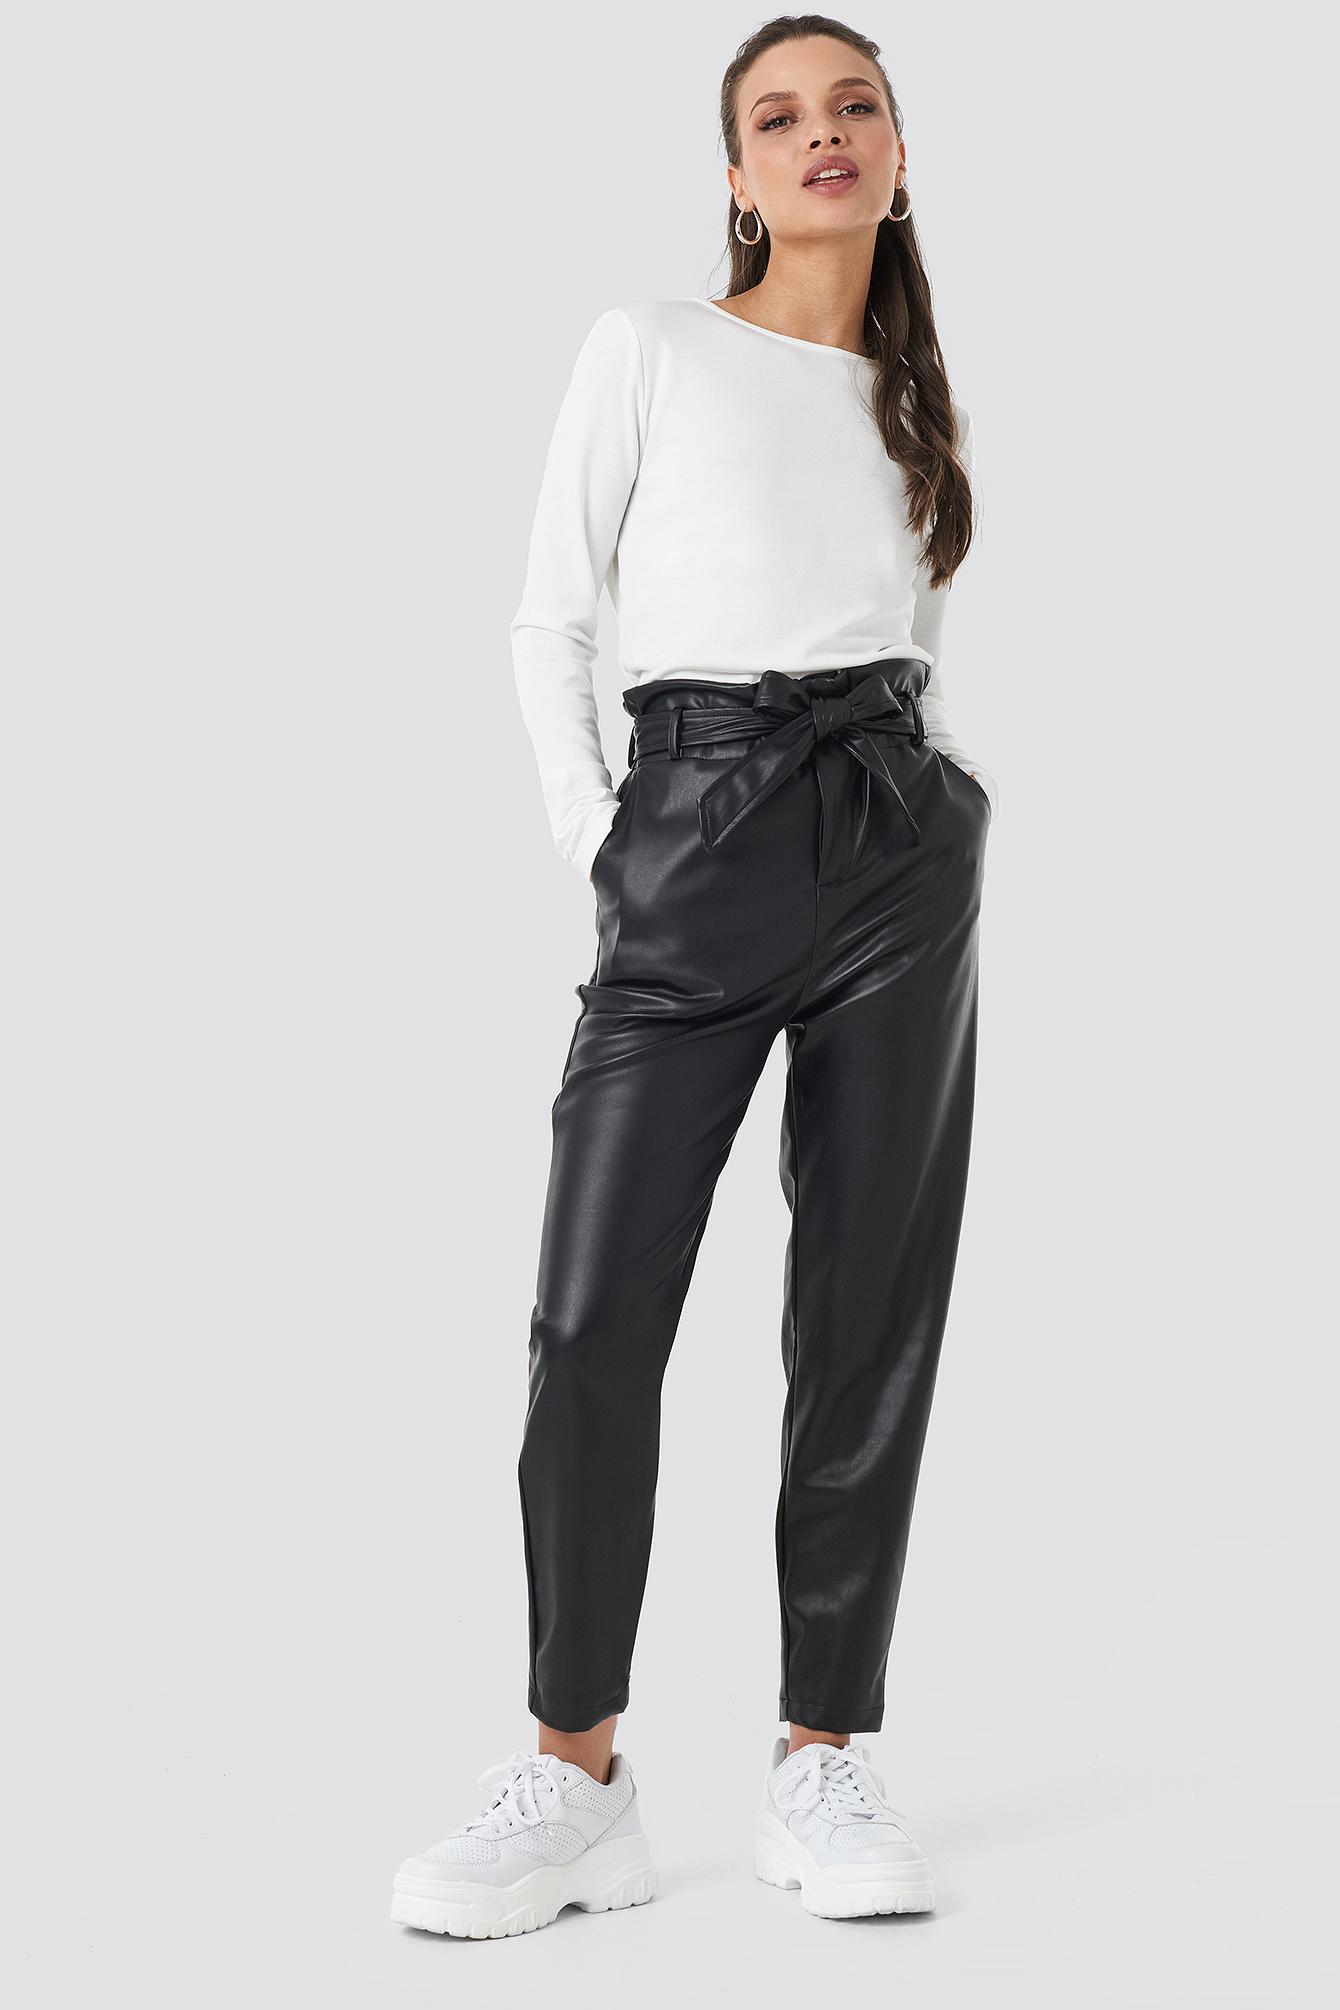 Jasmin PU Paperbag Pants NA-KD.COM